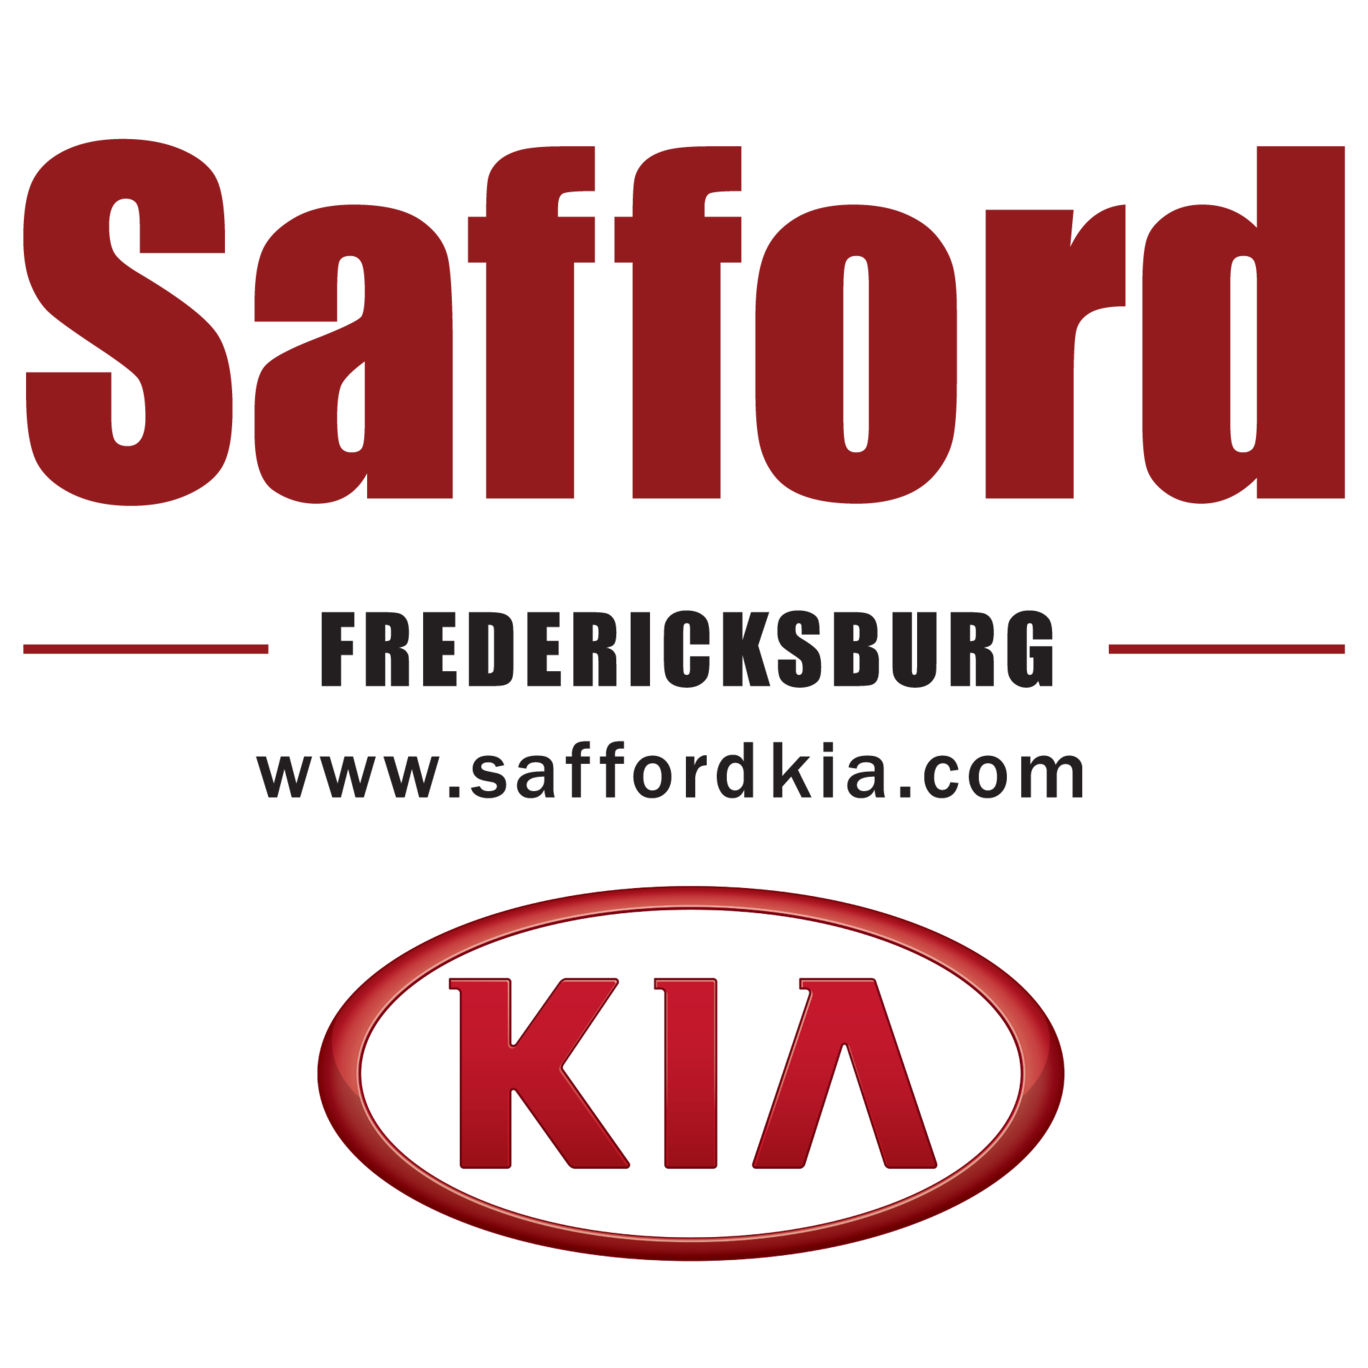 Safford Kia Fredericksburg, Fredericksburg Virginia (VA